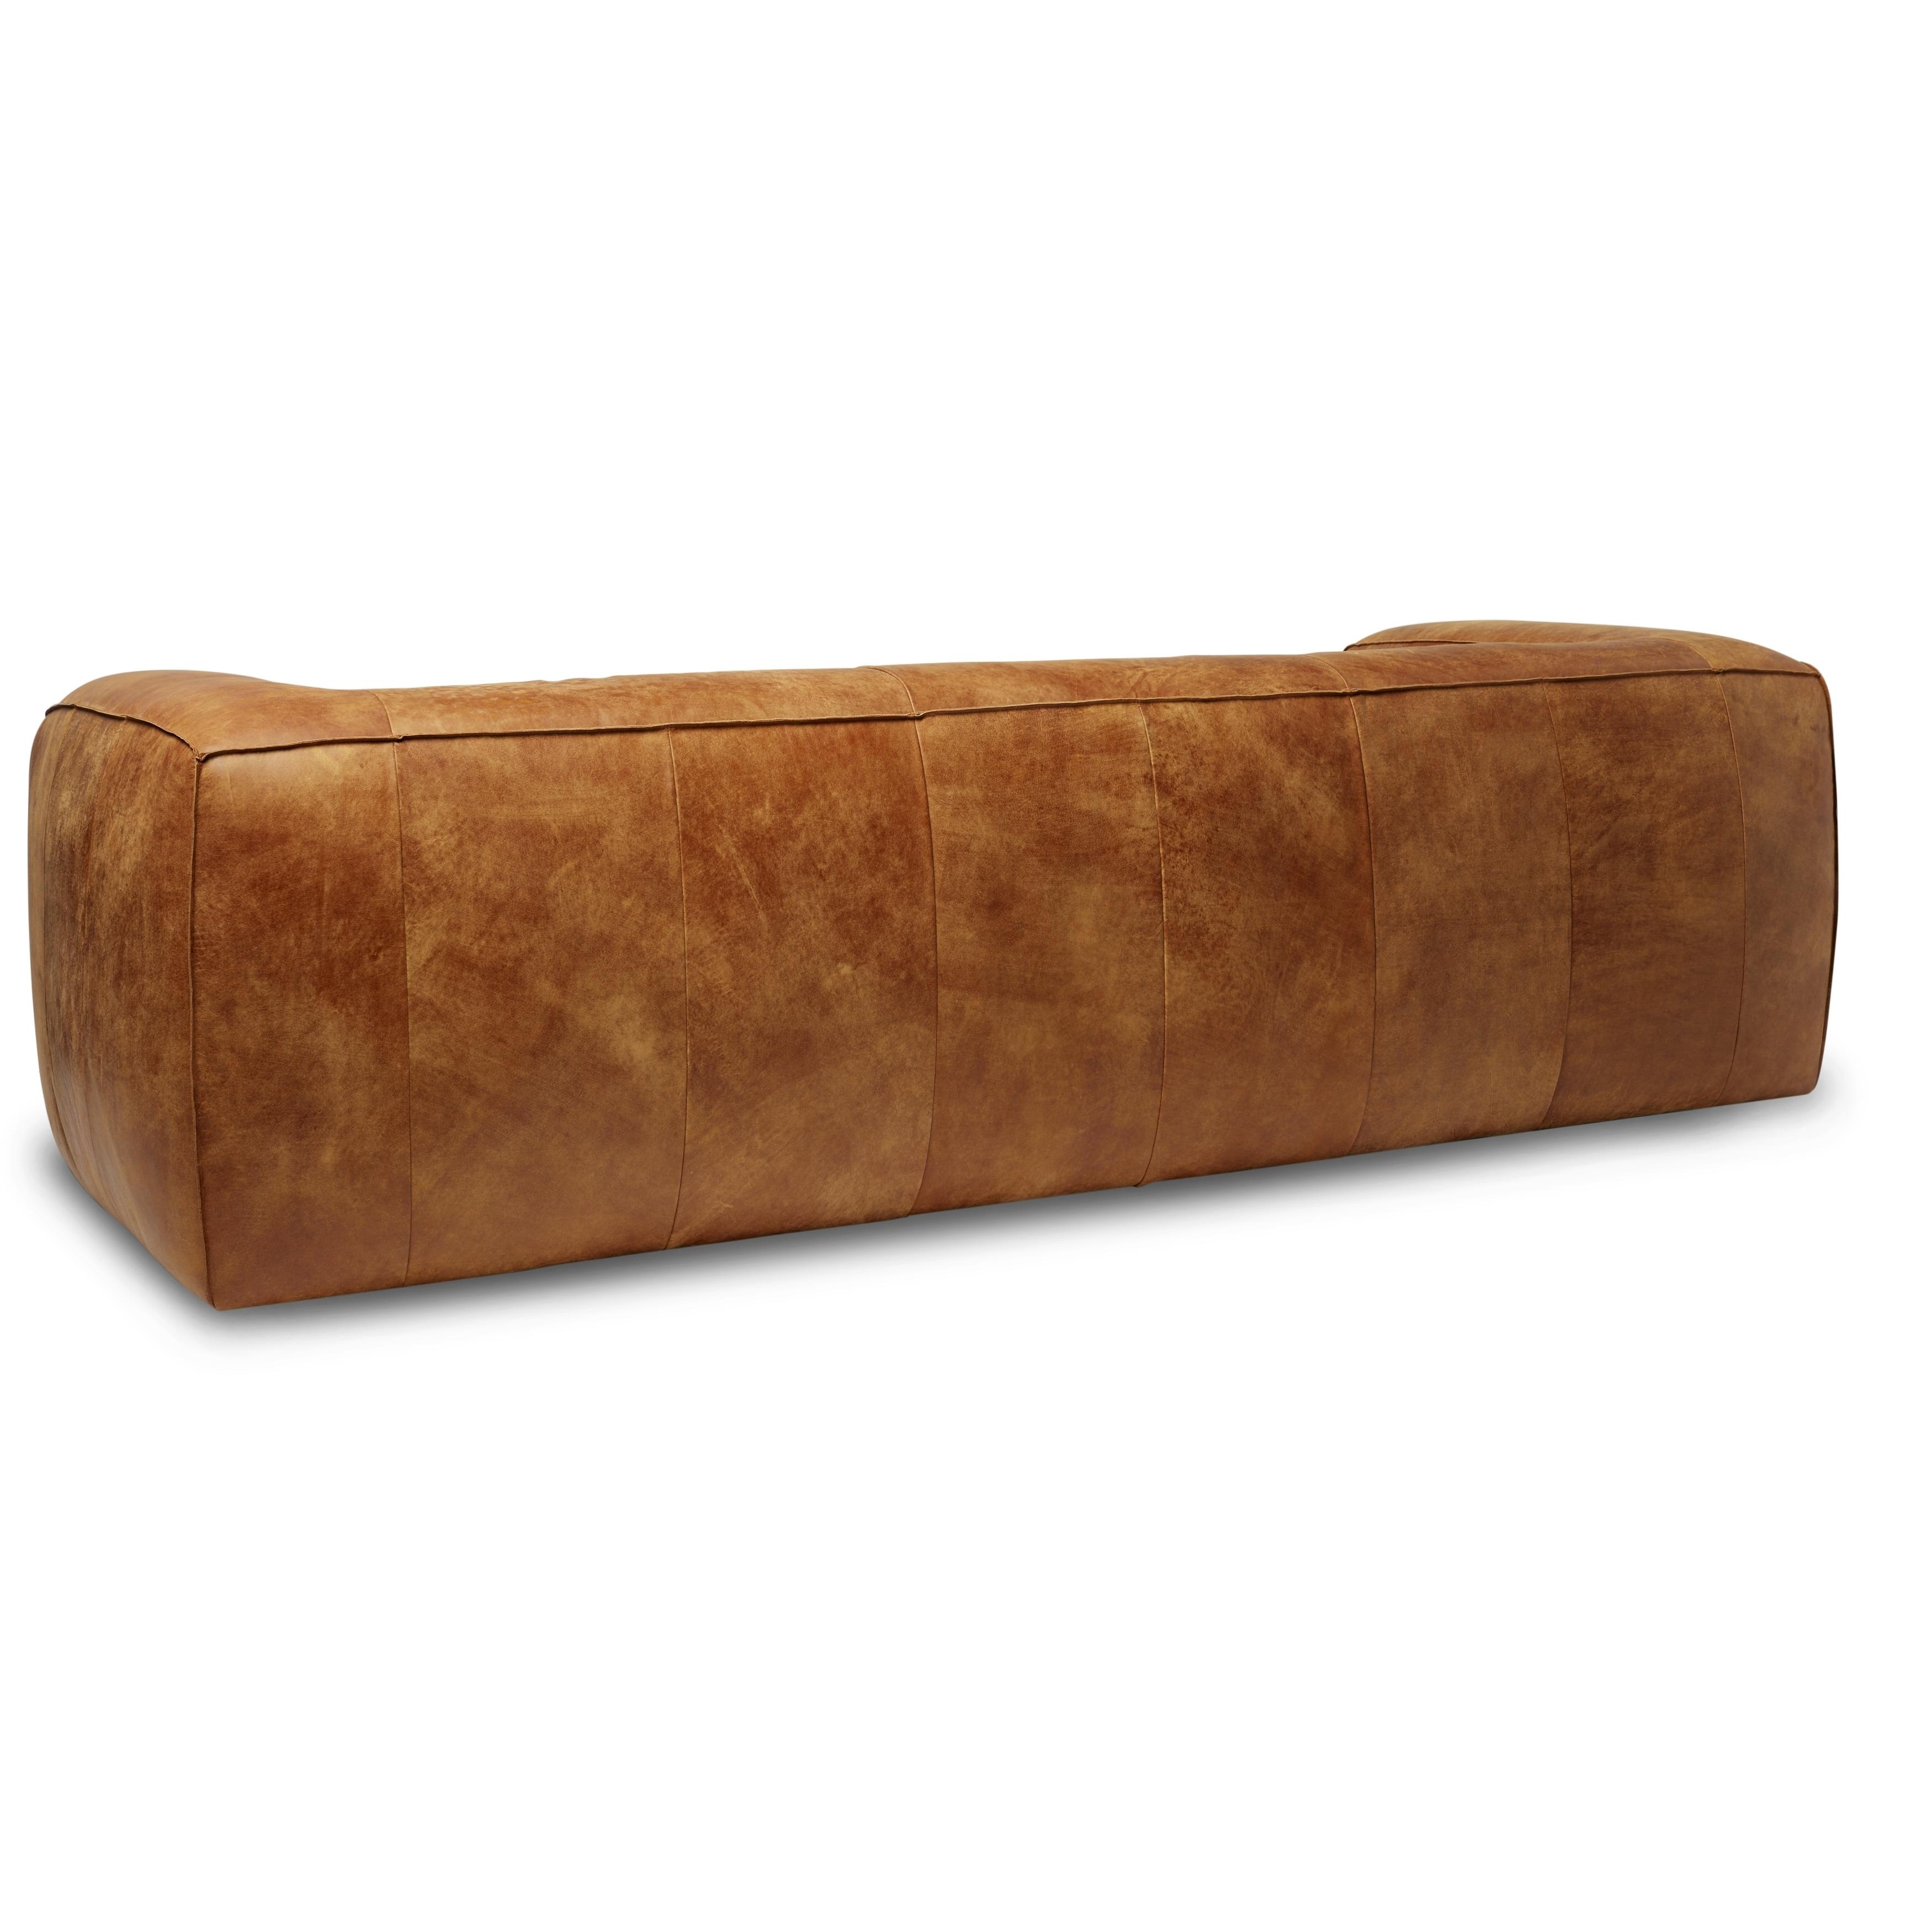 Miraculous Strick Bolton Diva Outback Bridle Italian Leather Sofa Customarchery Wood Chair Design Ideas Customarcherynet